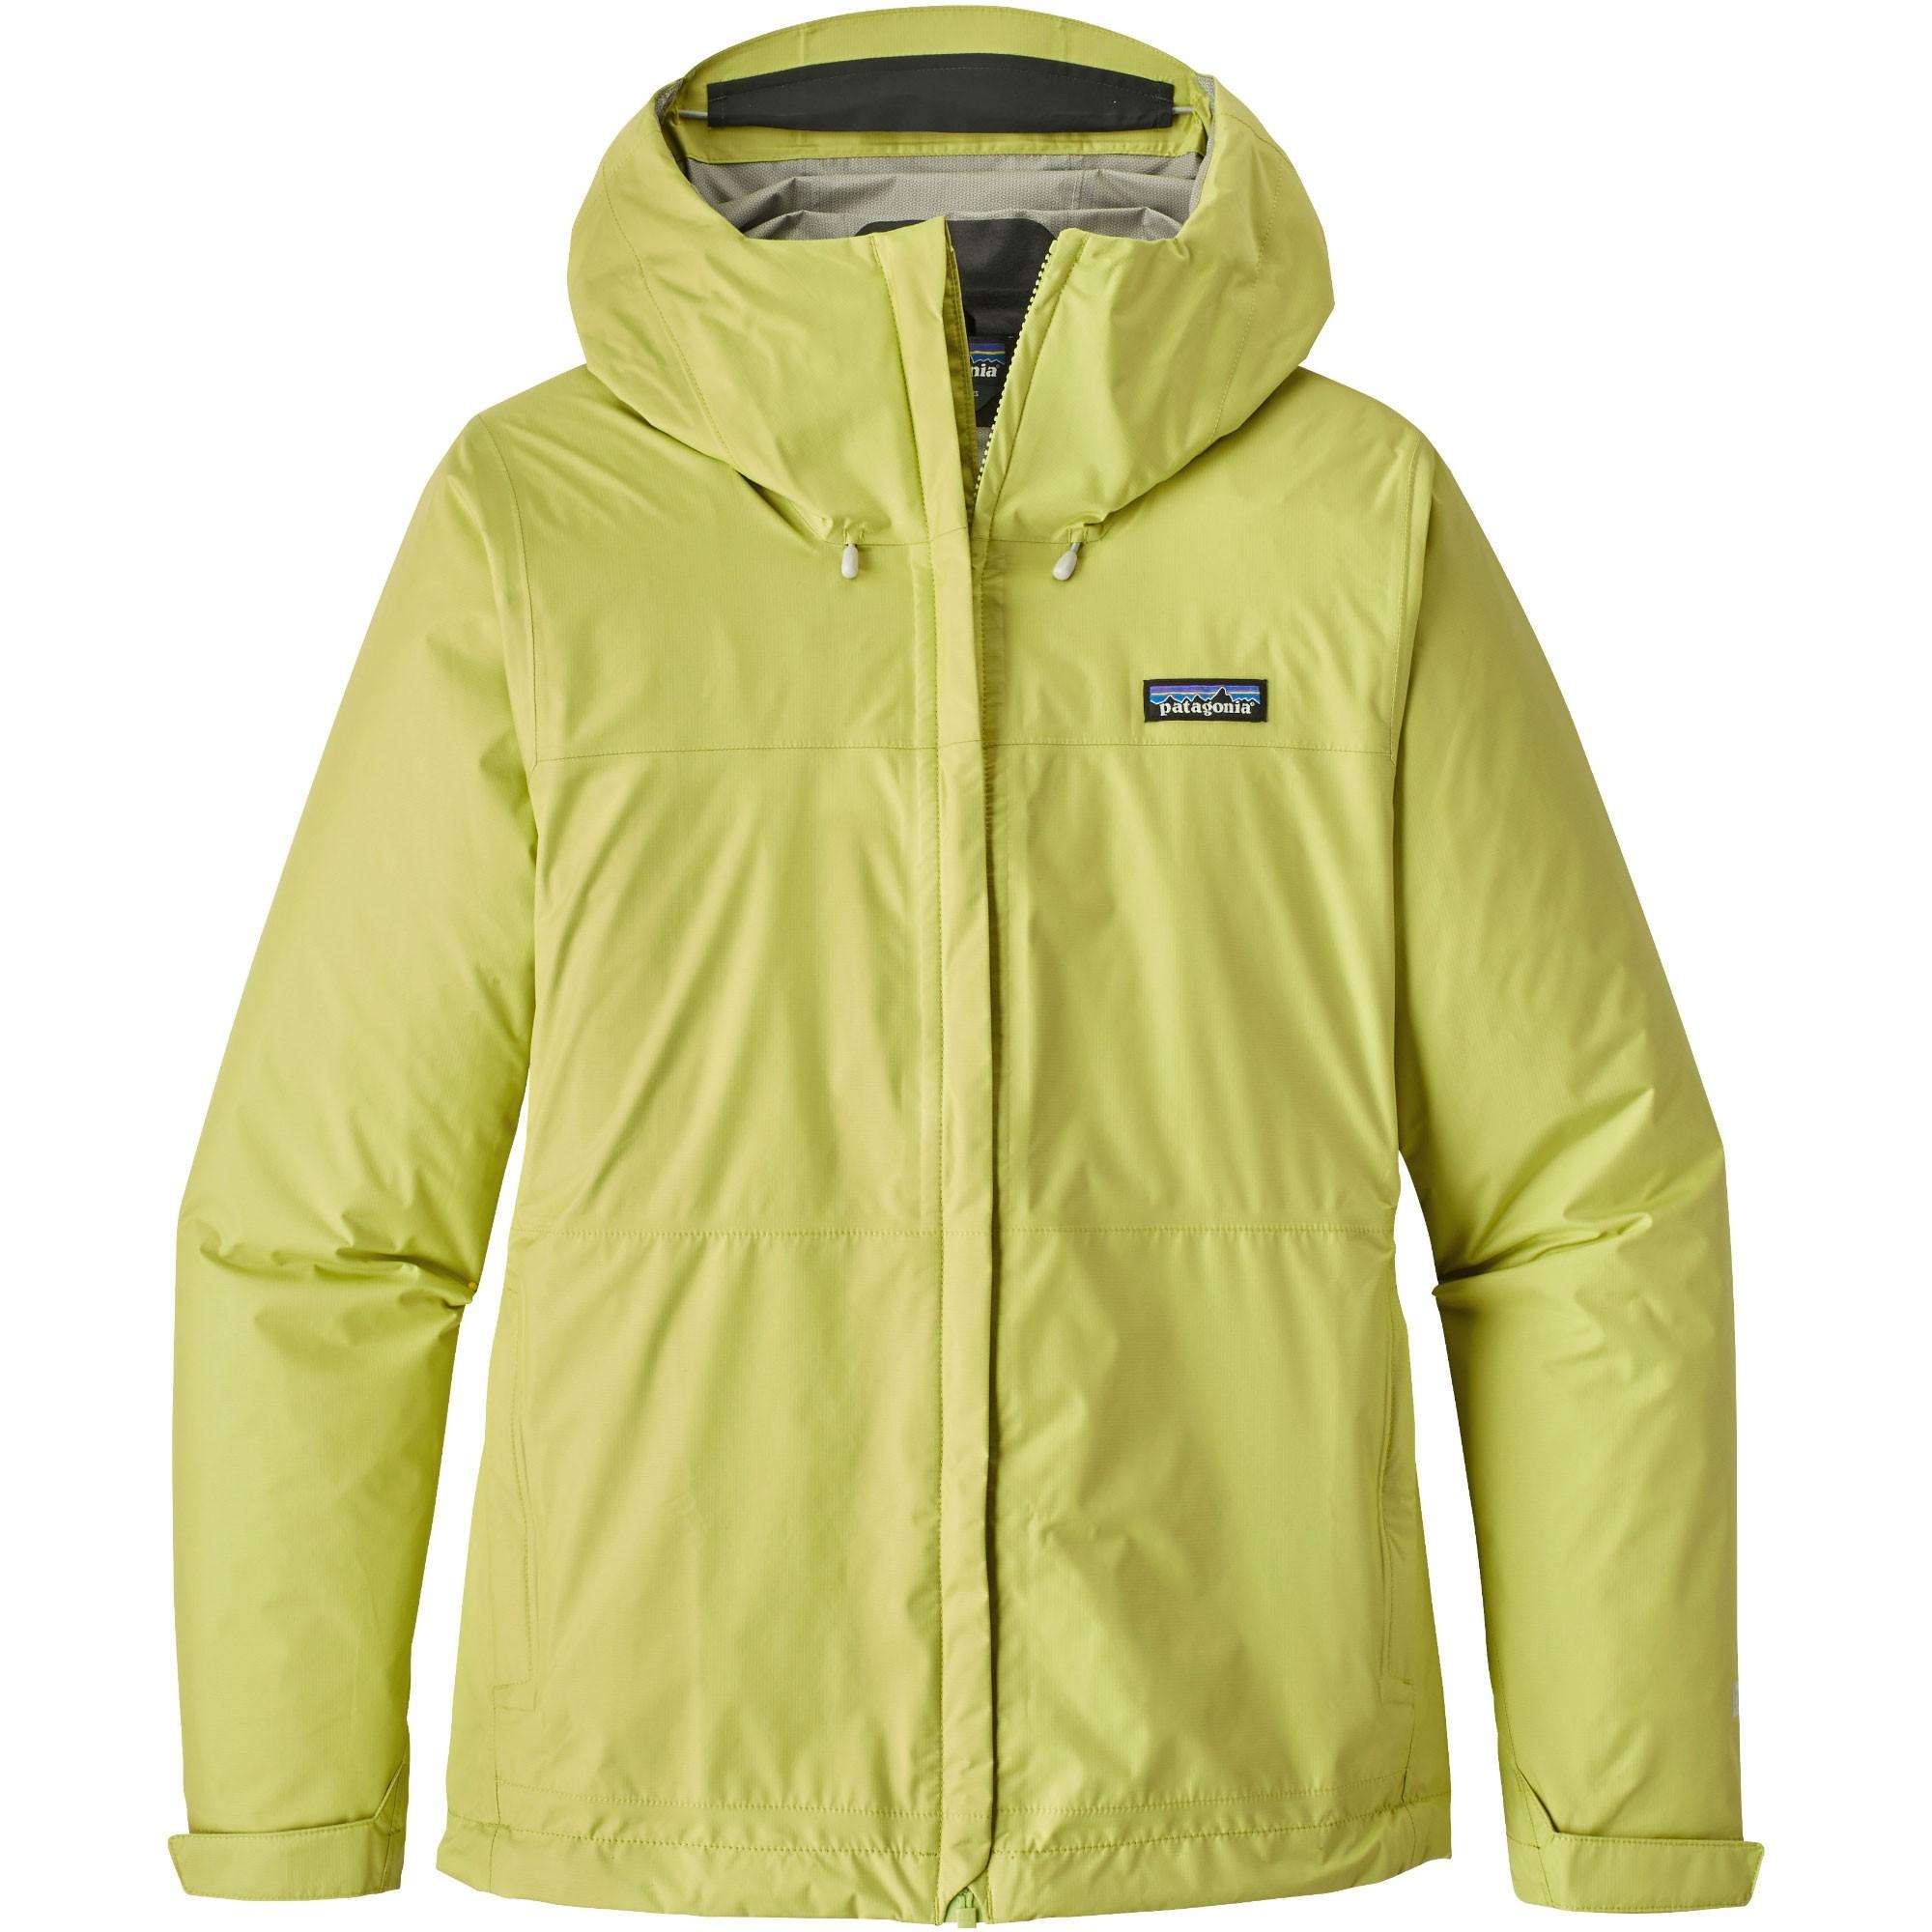 Patagonia-Torrentshell-Jacket-Womens-Celery-S18